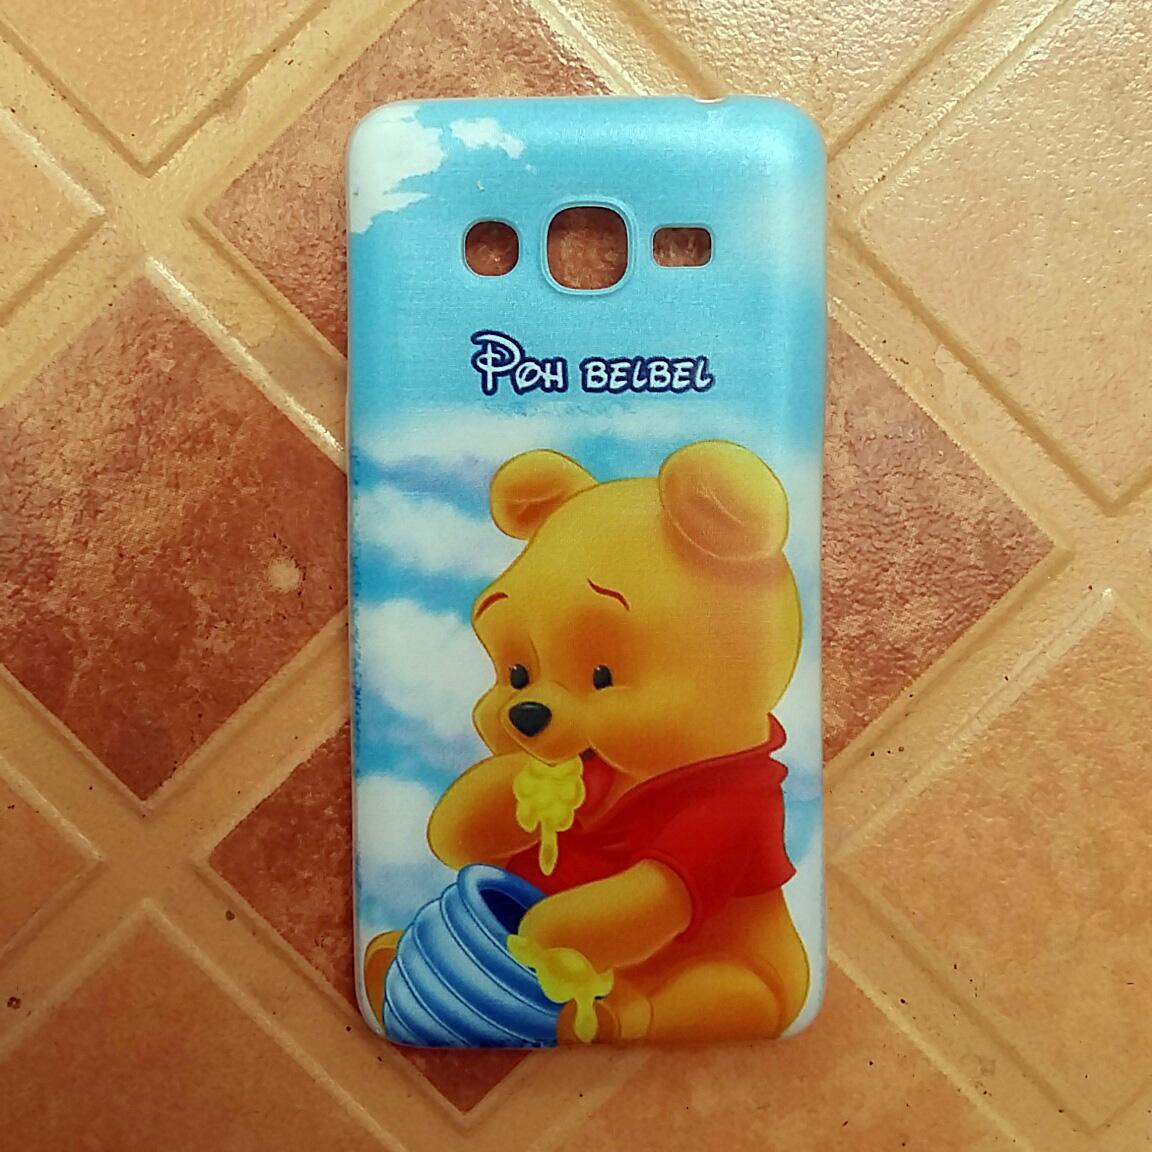 casing gambar winnie the pooh